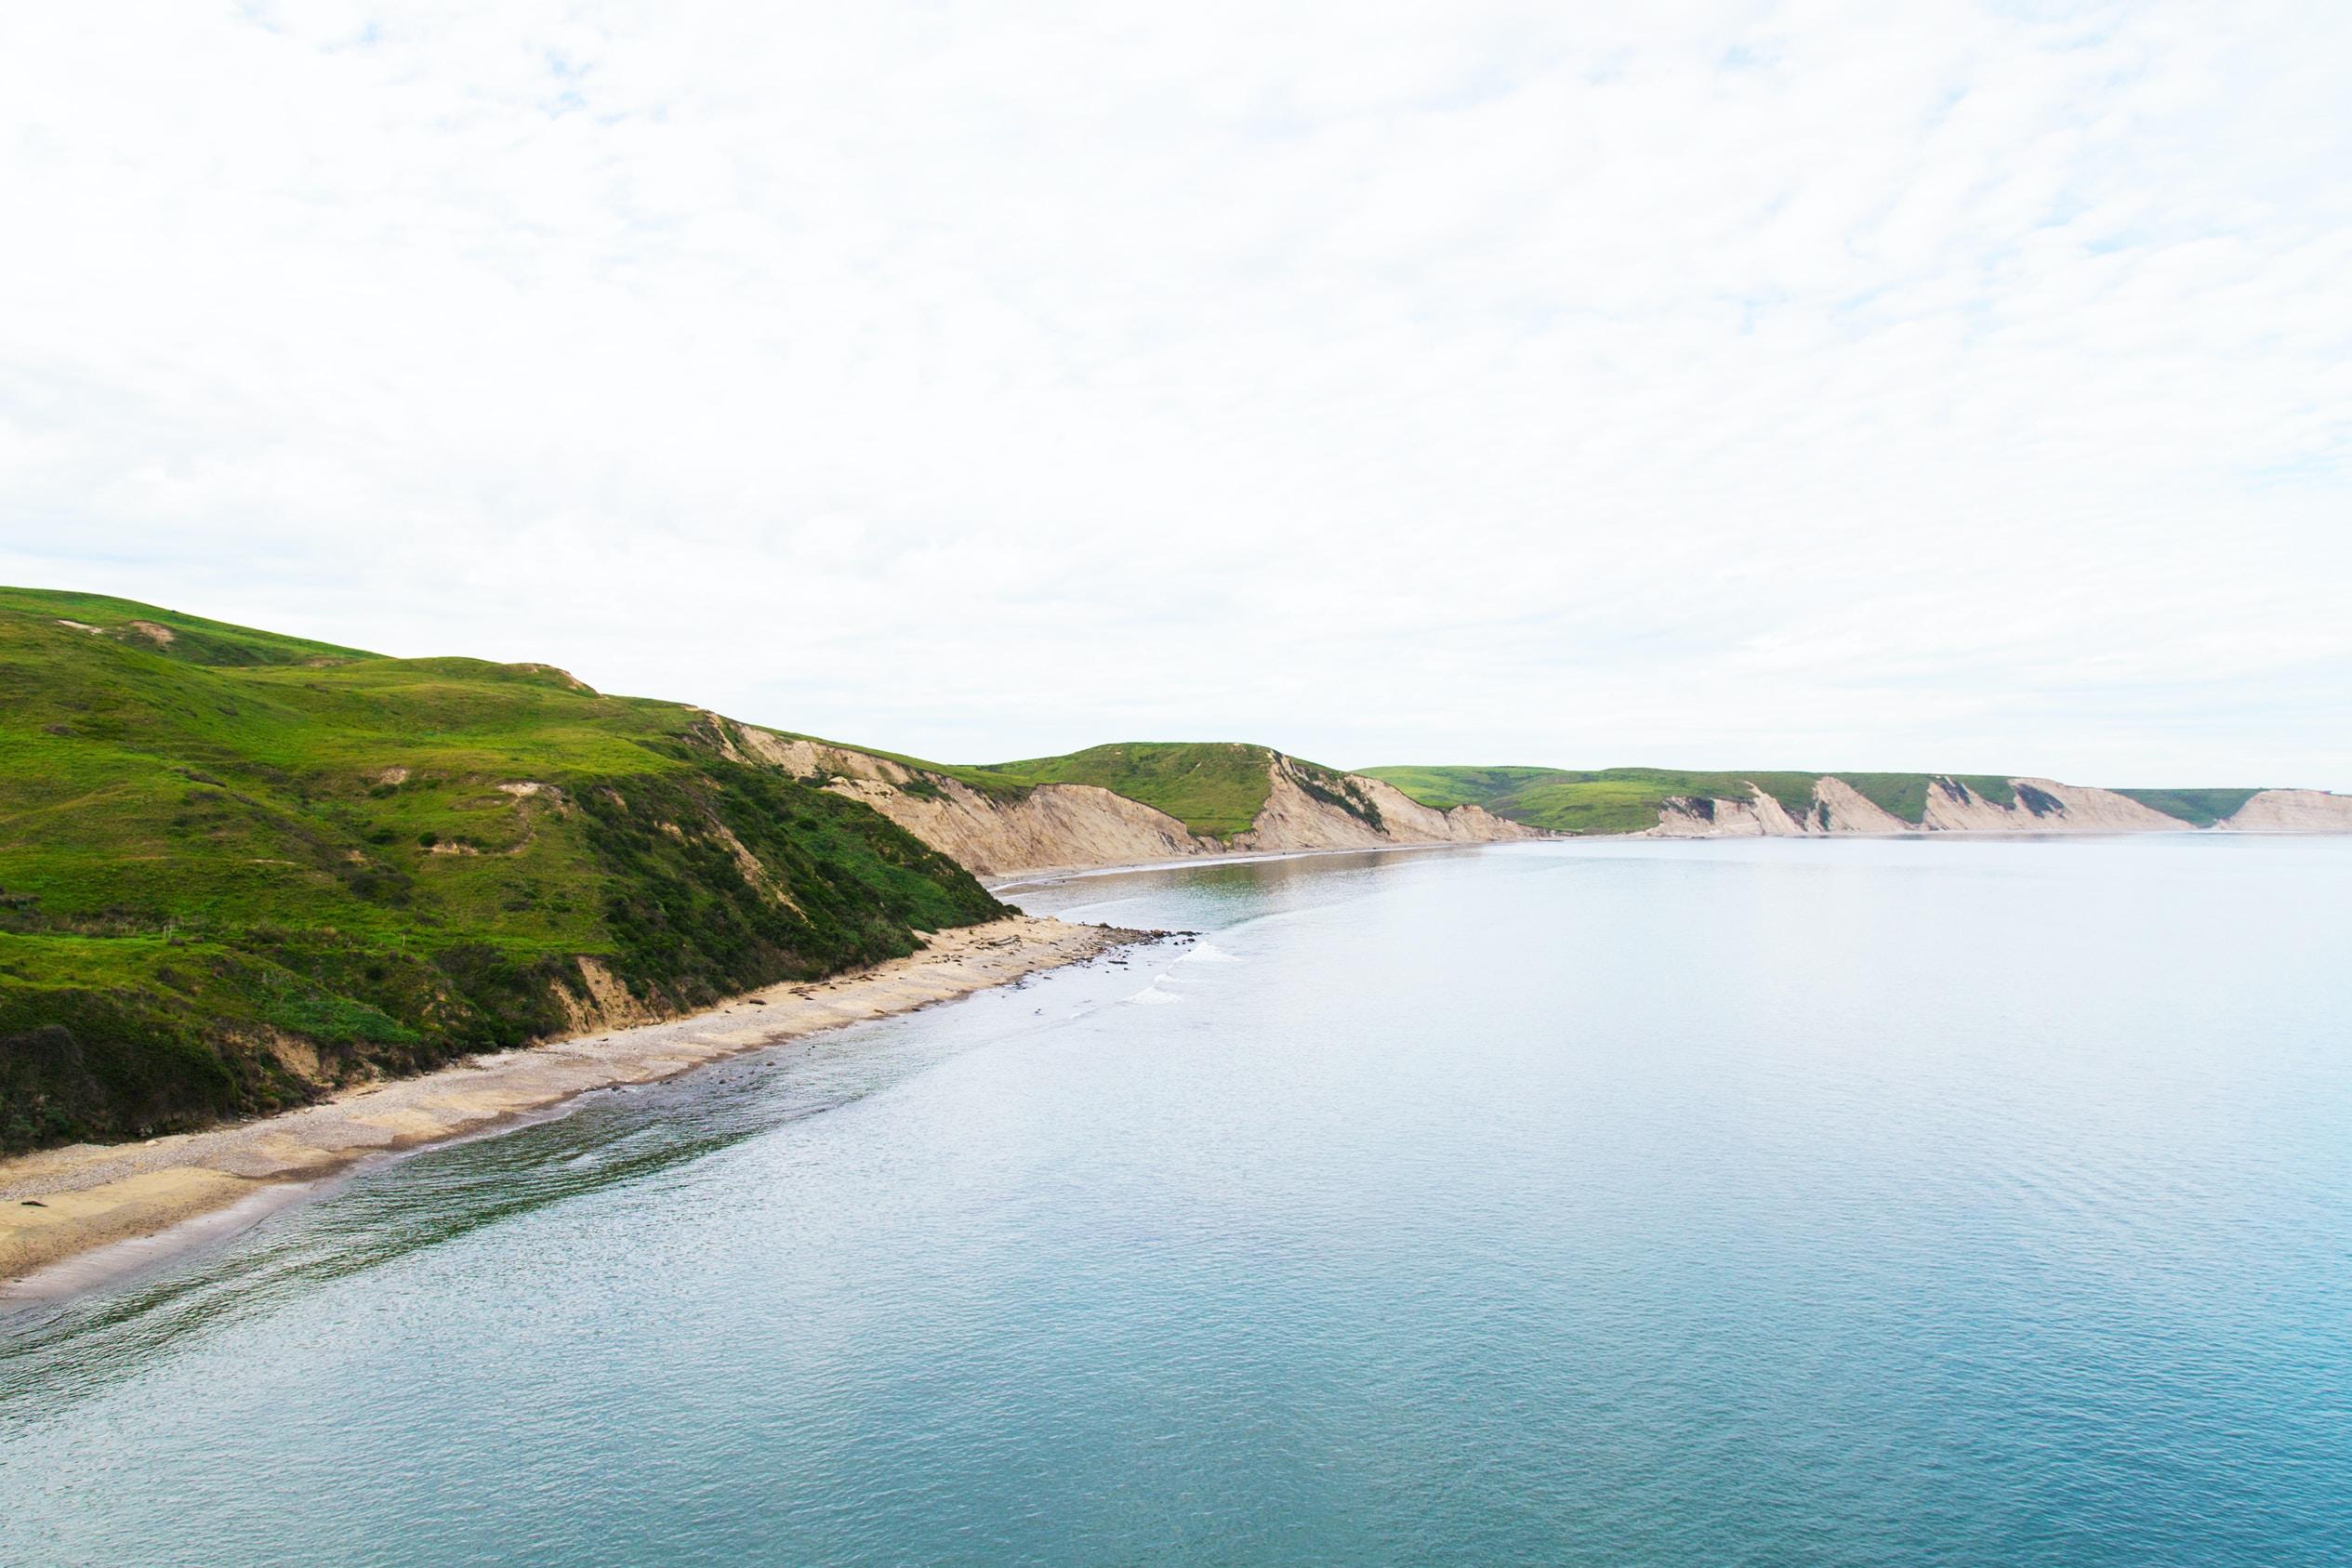 A sandy coastline with low grassy cliffs